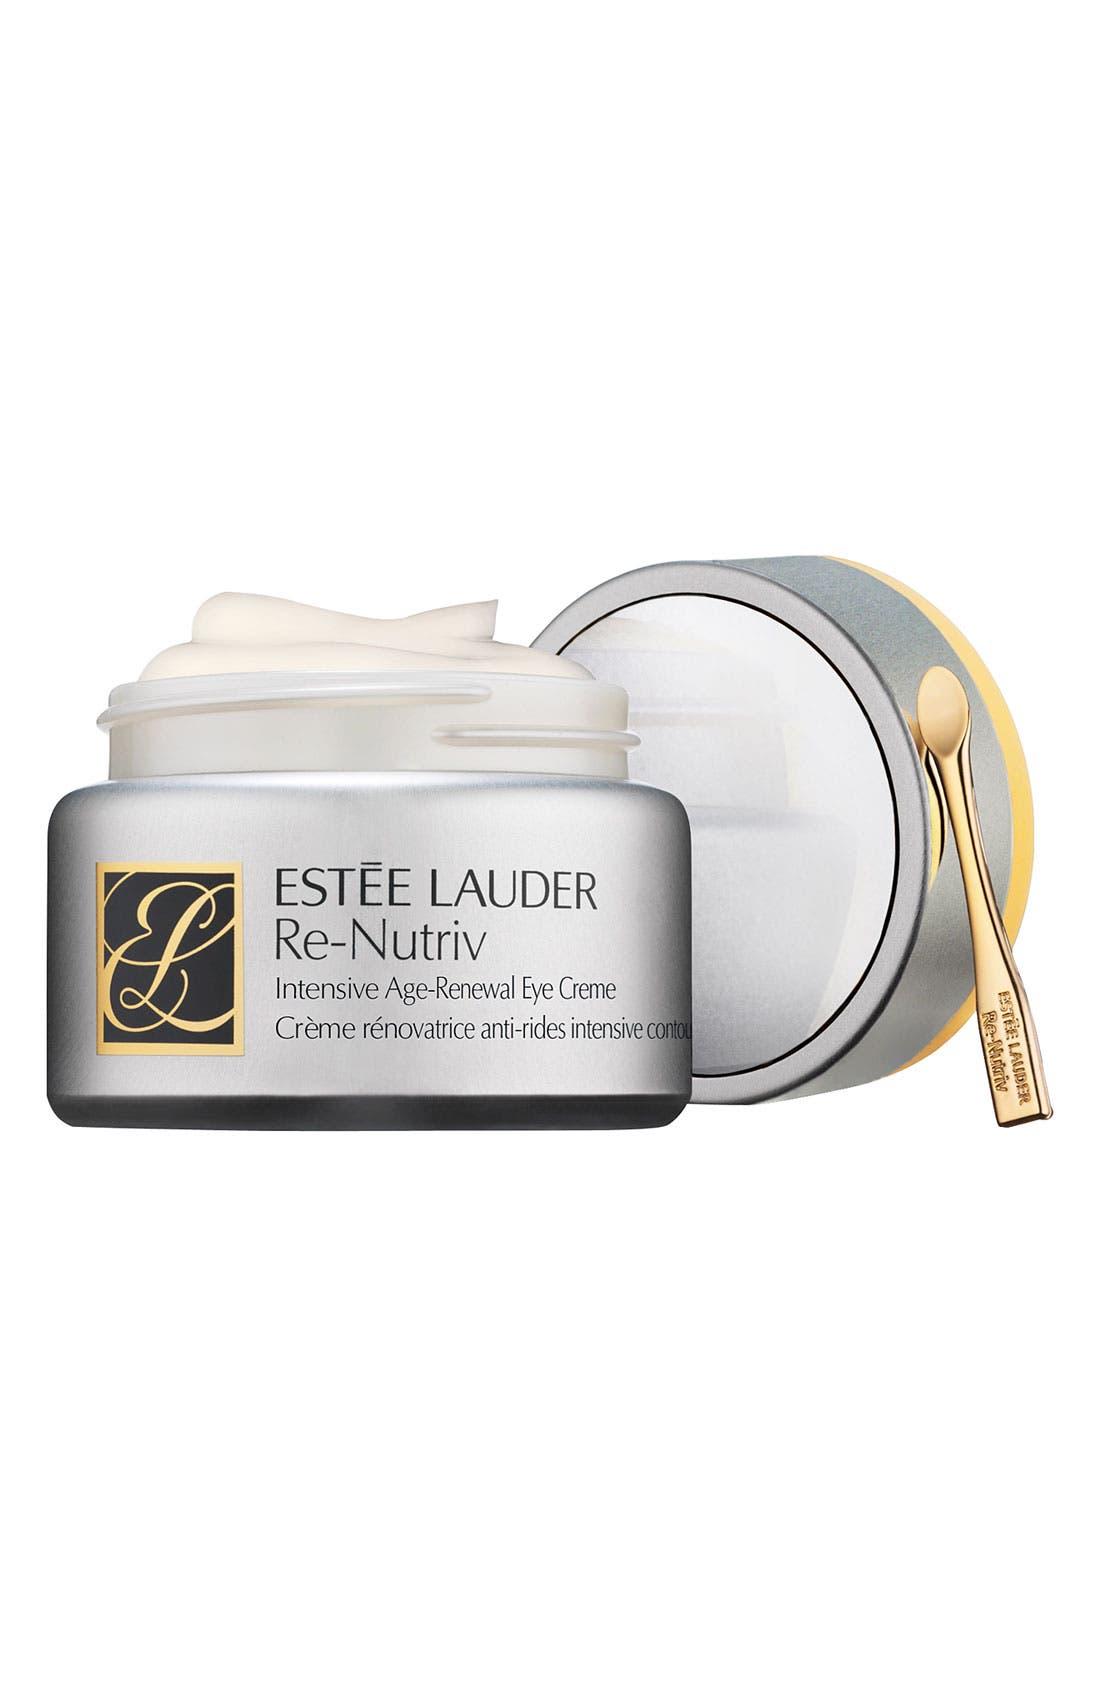 Estée Lauder Re-Nutriv Intensive Age Renewal Eye Crème